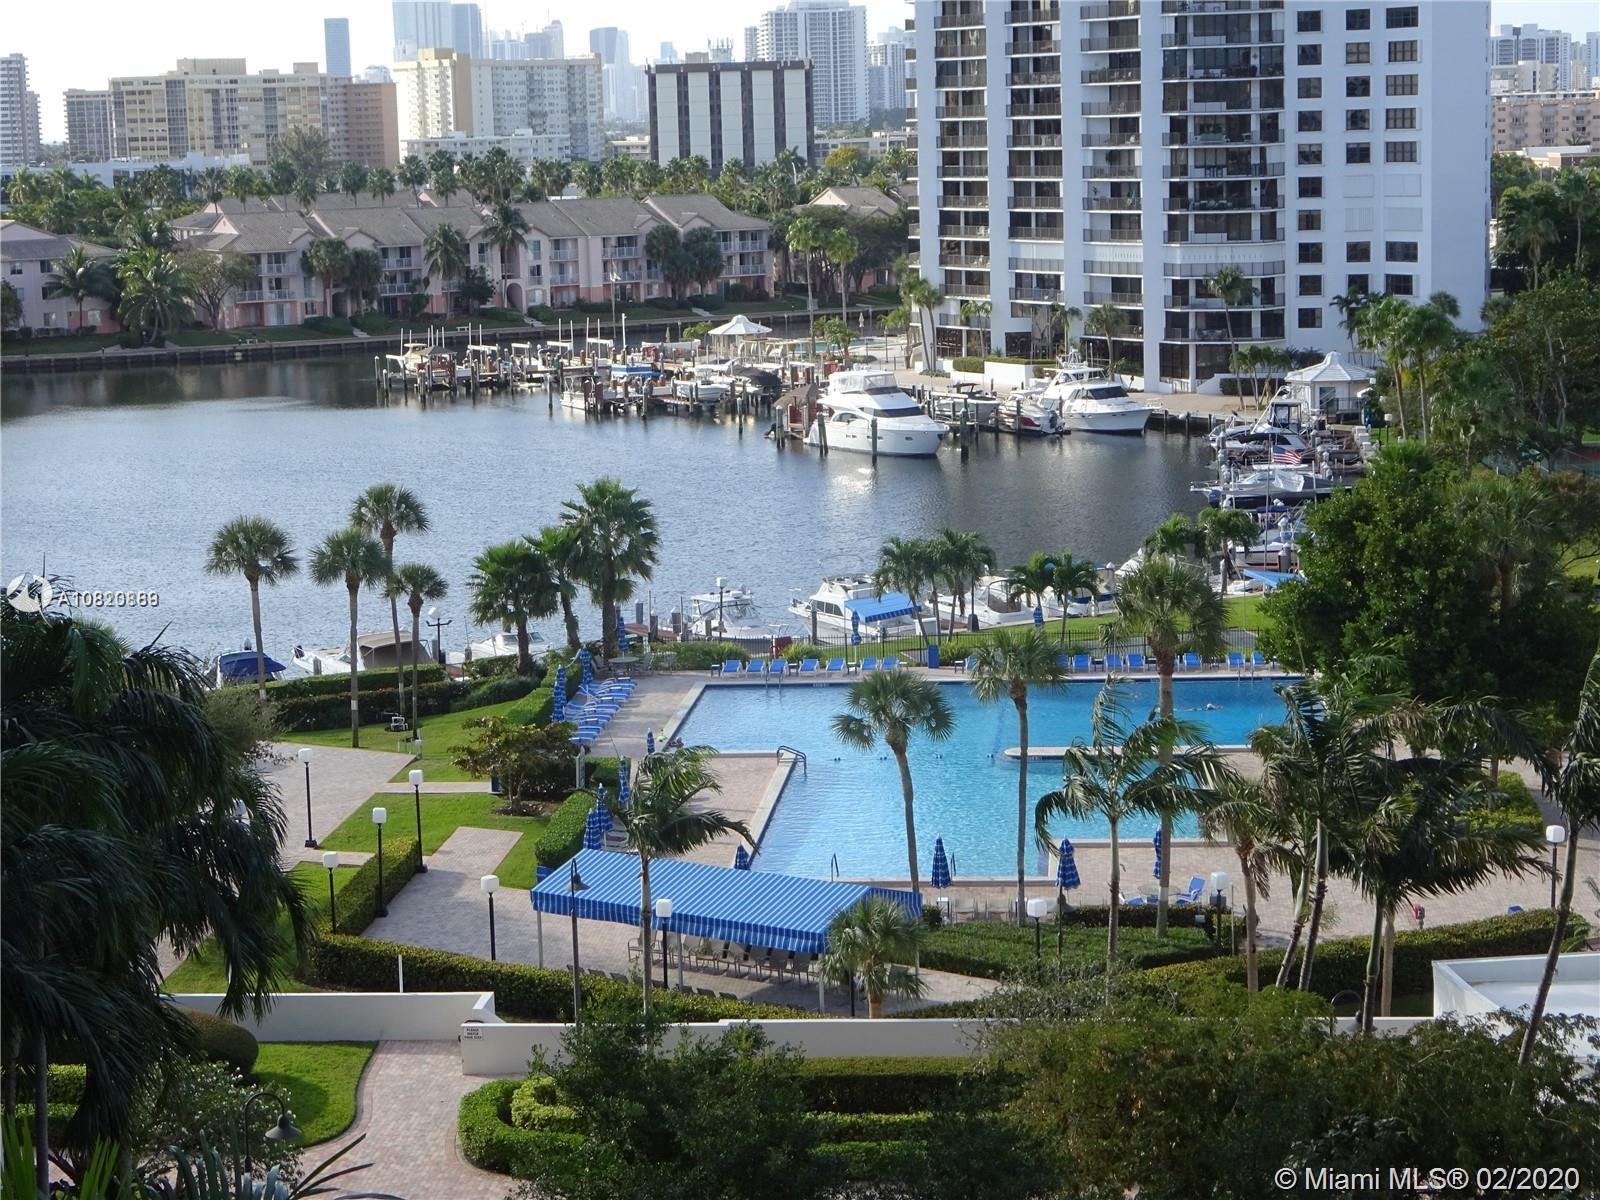 Olympus C #916 - 2500 Parkview Dr #916, Hallandale Beach, FL 33009